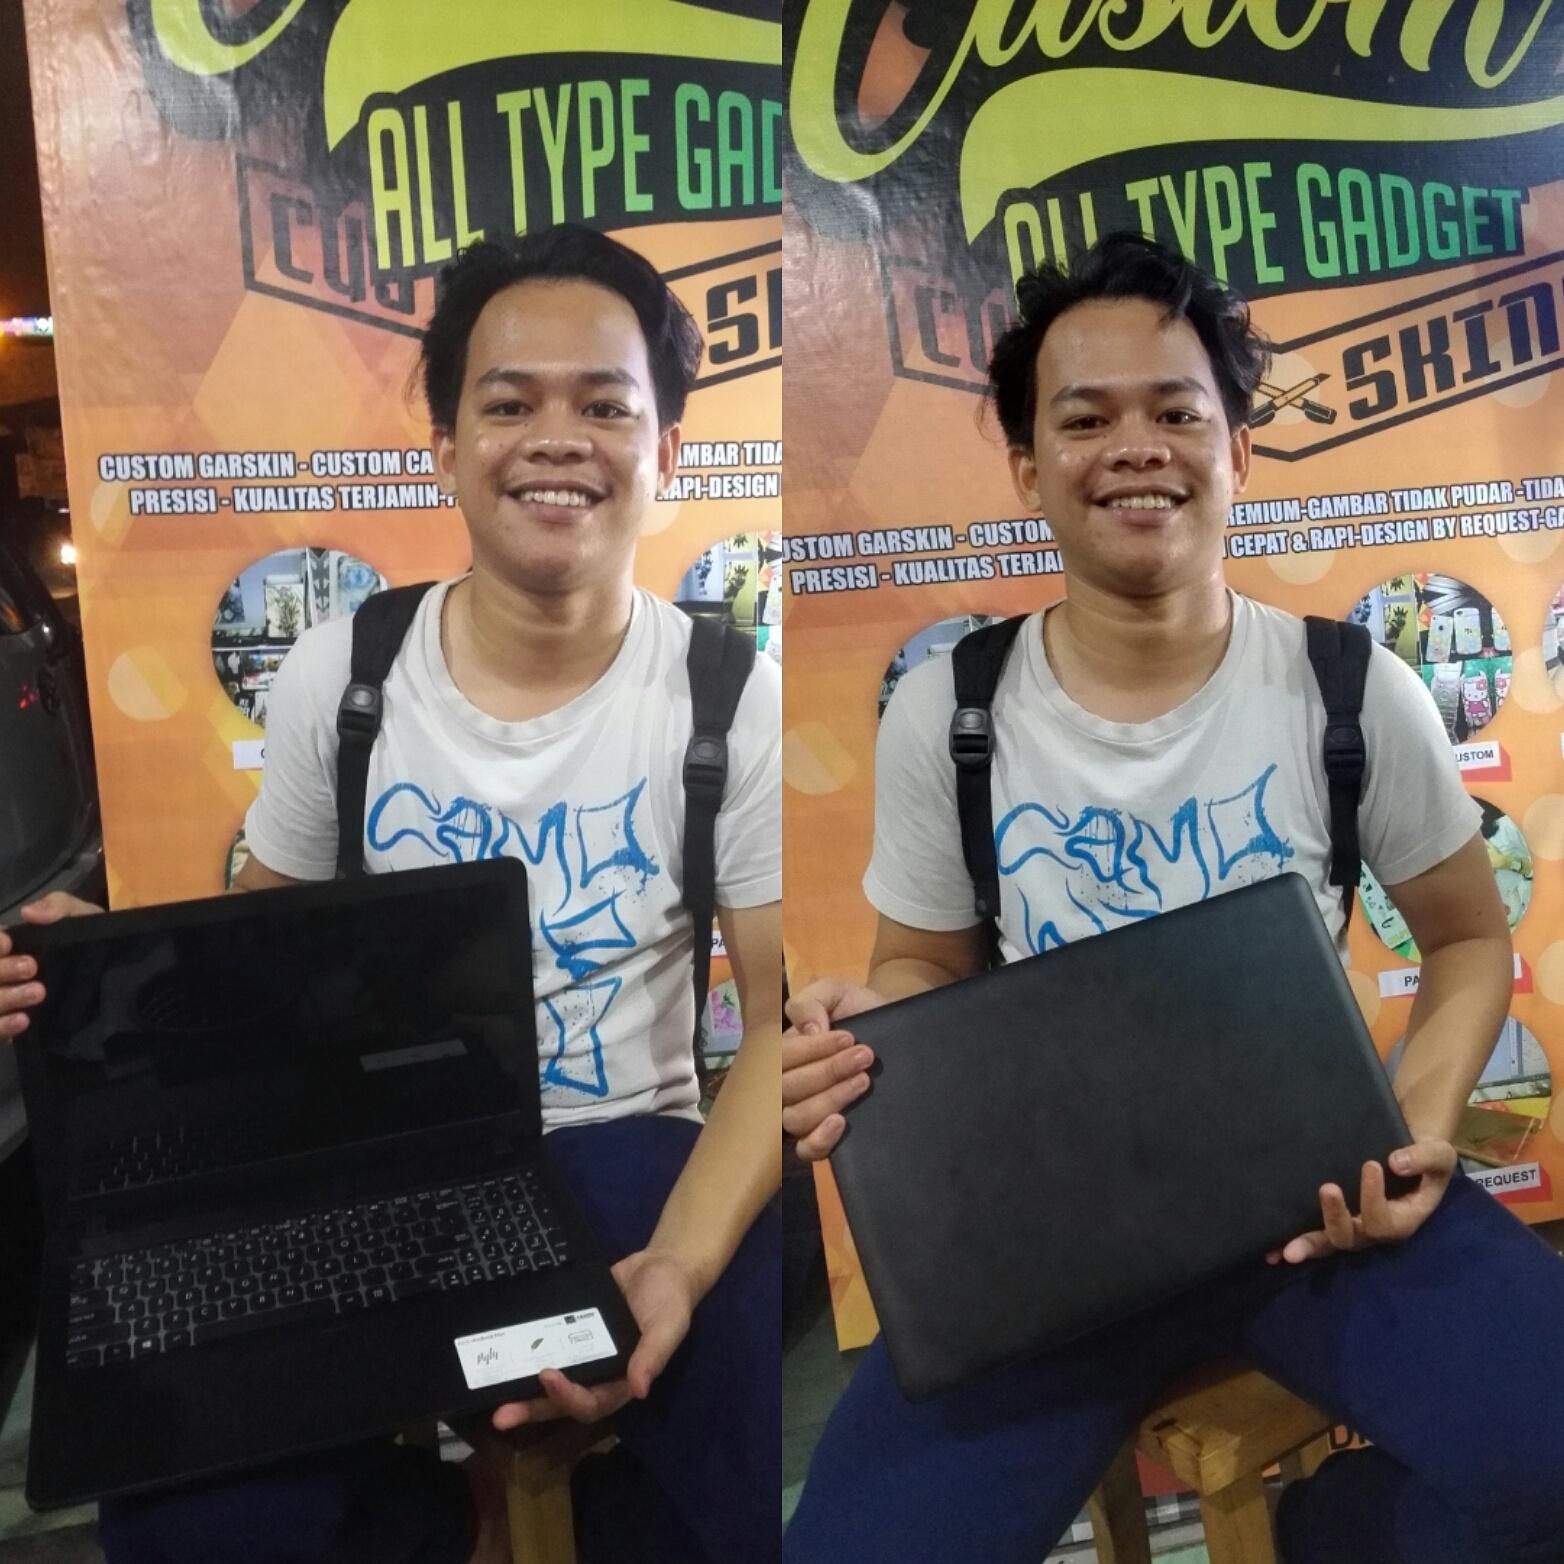 Custom Garskin Softcase Hardcase Jogja 2018 Hp Skin Request Hub Wa 089 6082 44401